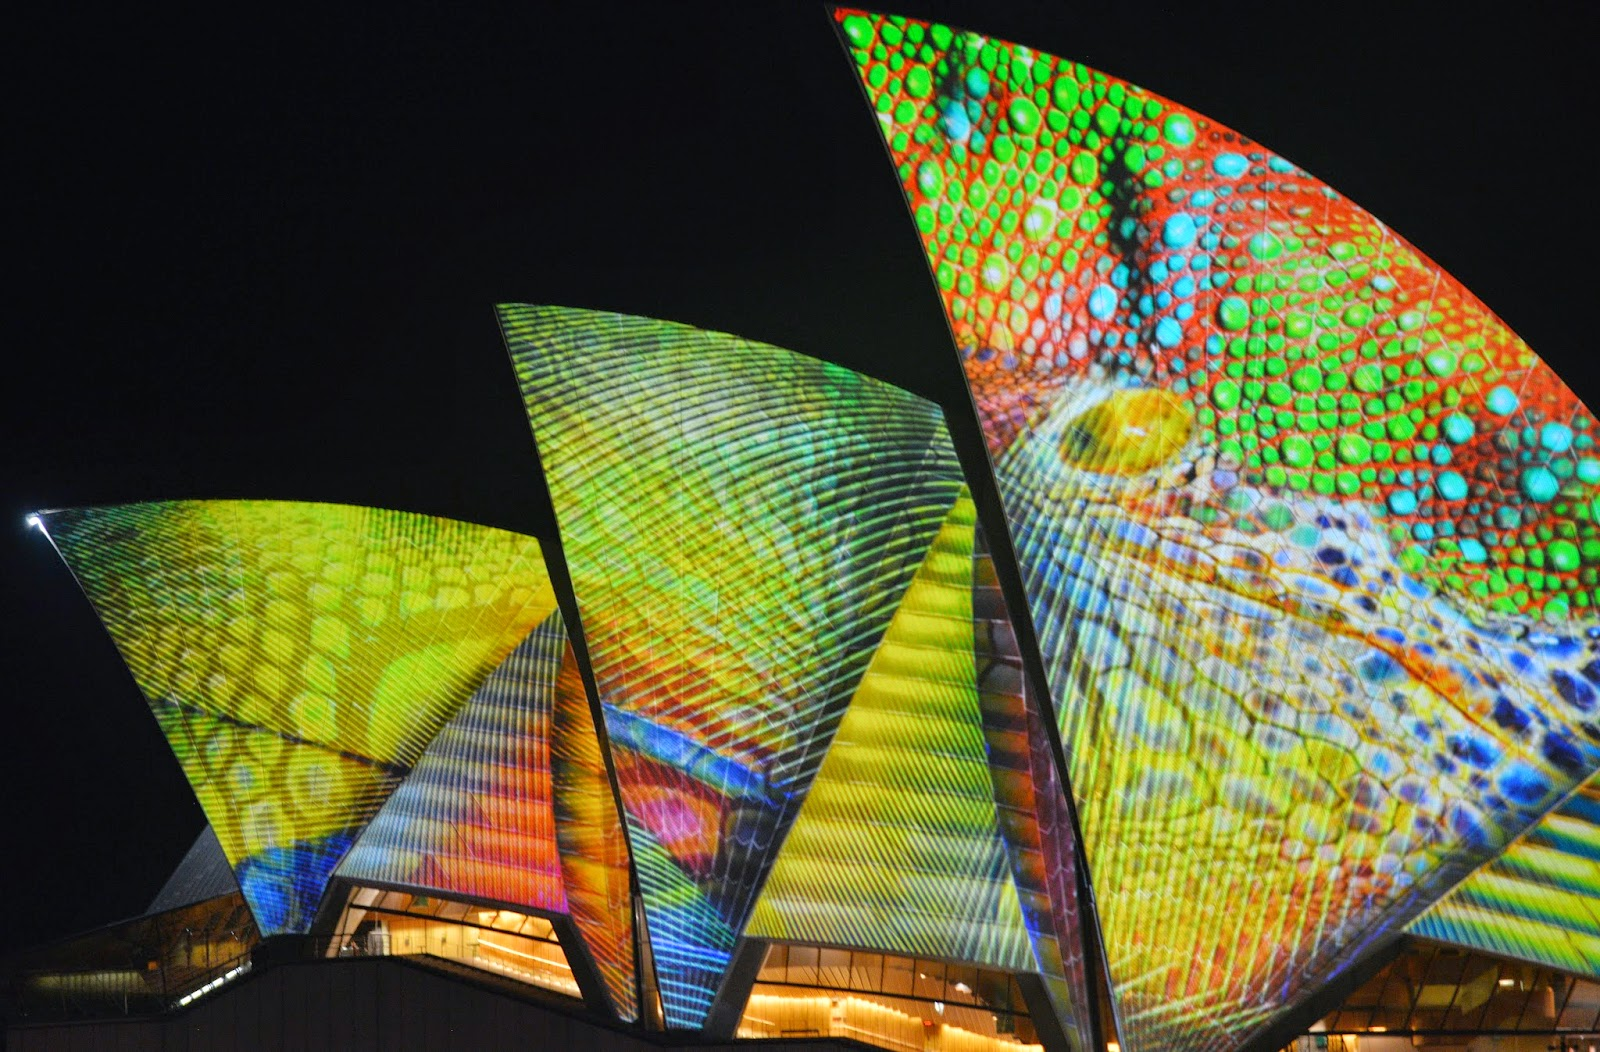 Australia, Culture, Festival of Lights, Lights Festival, News, Offbeat, Sydney Light Show, Sydney Opera House, Vivid Festival, Vivid Festival Photo,